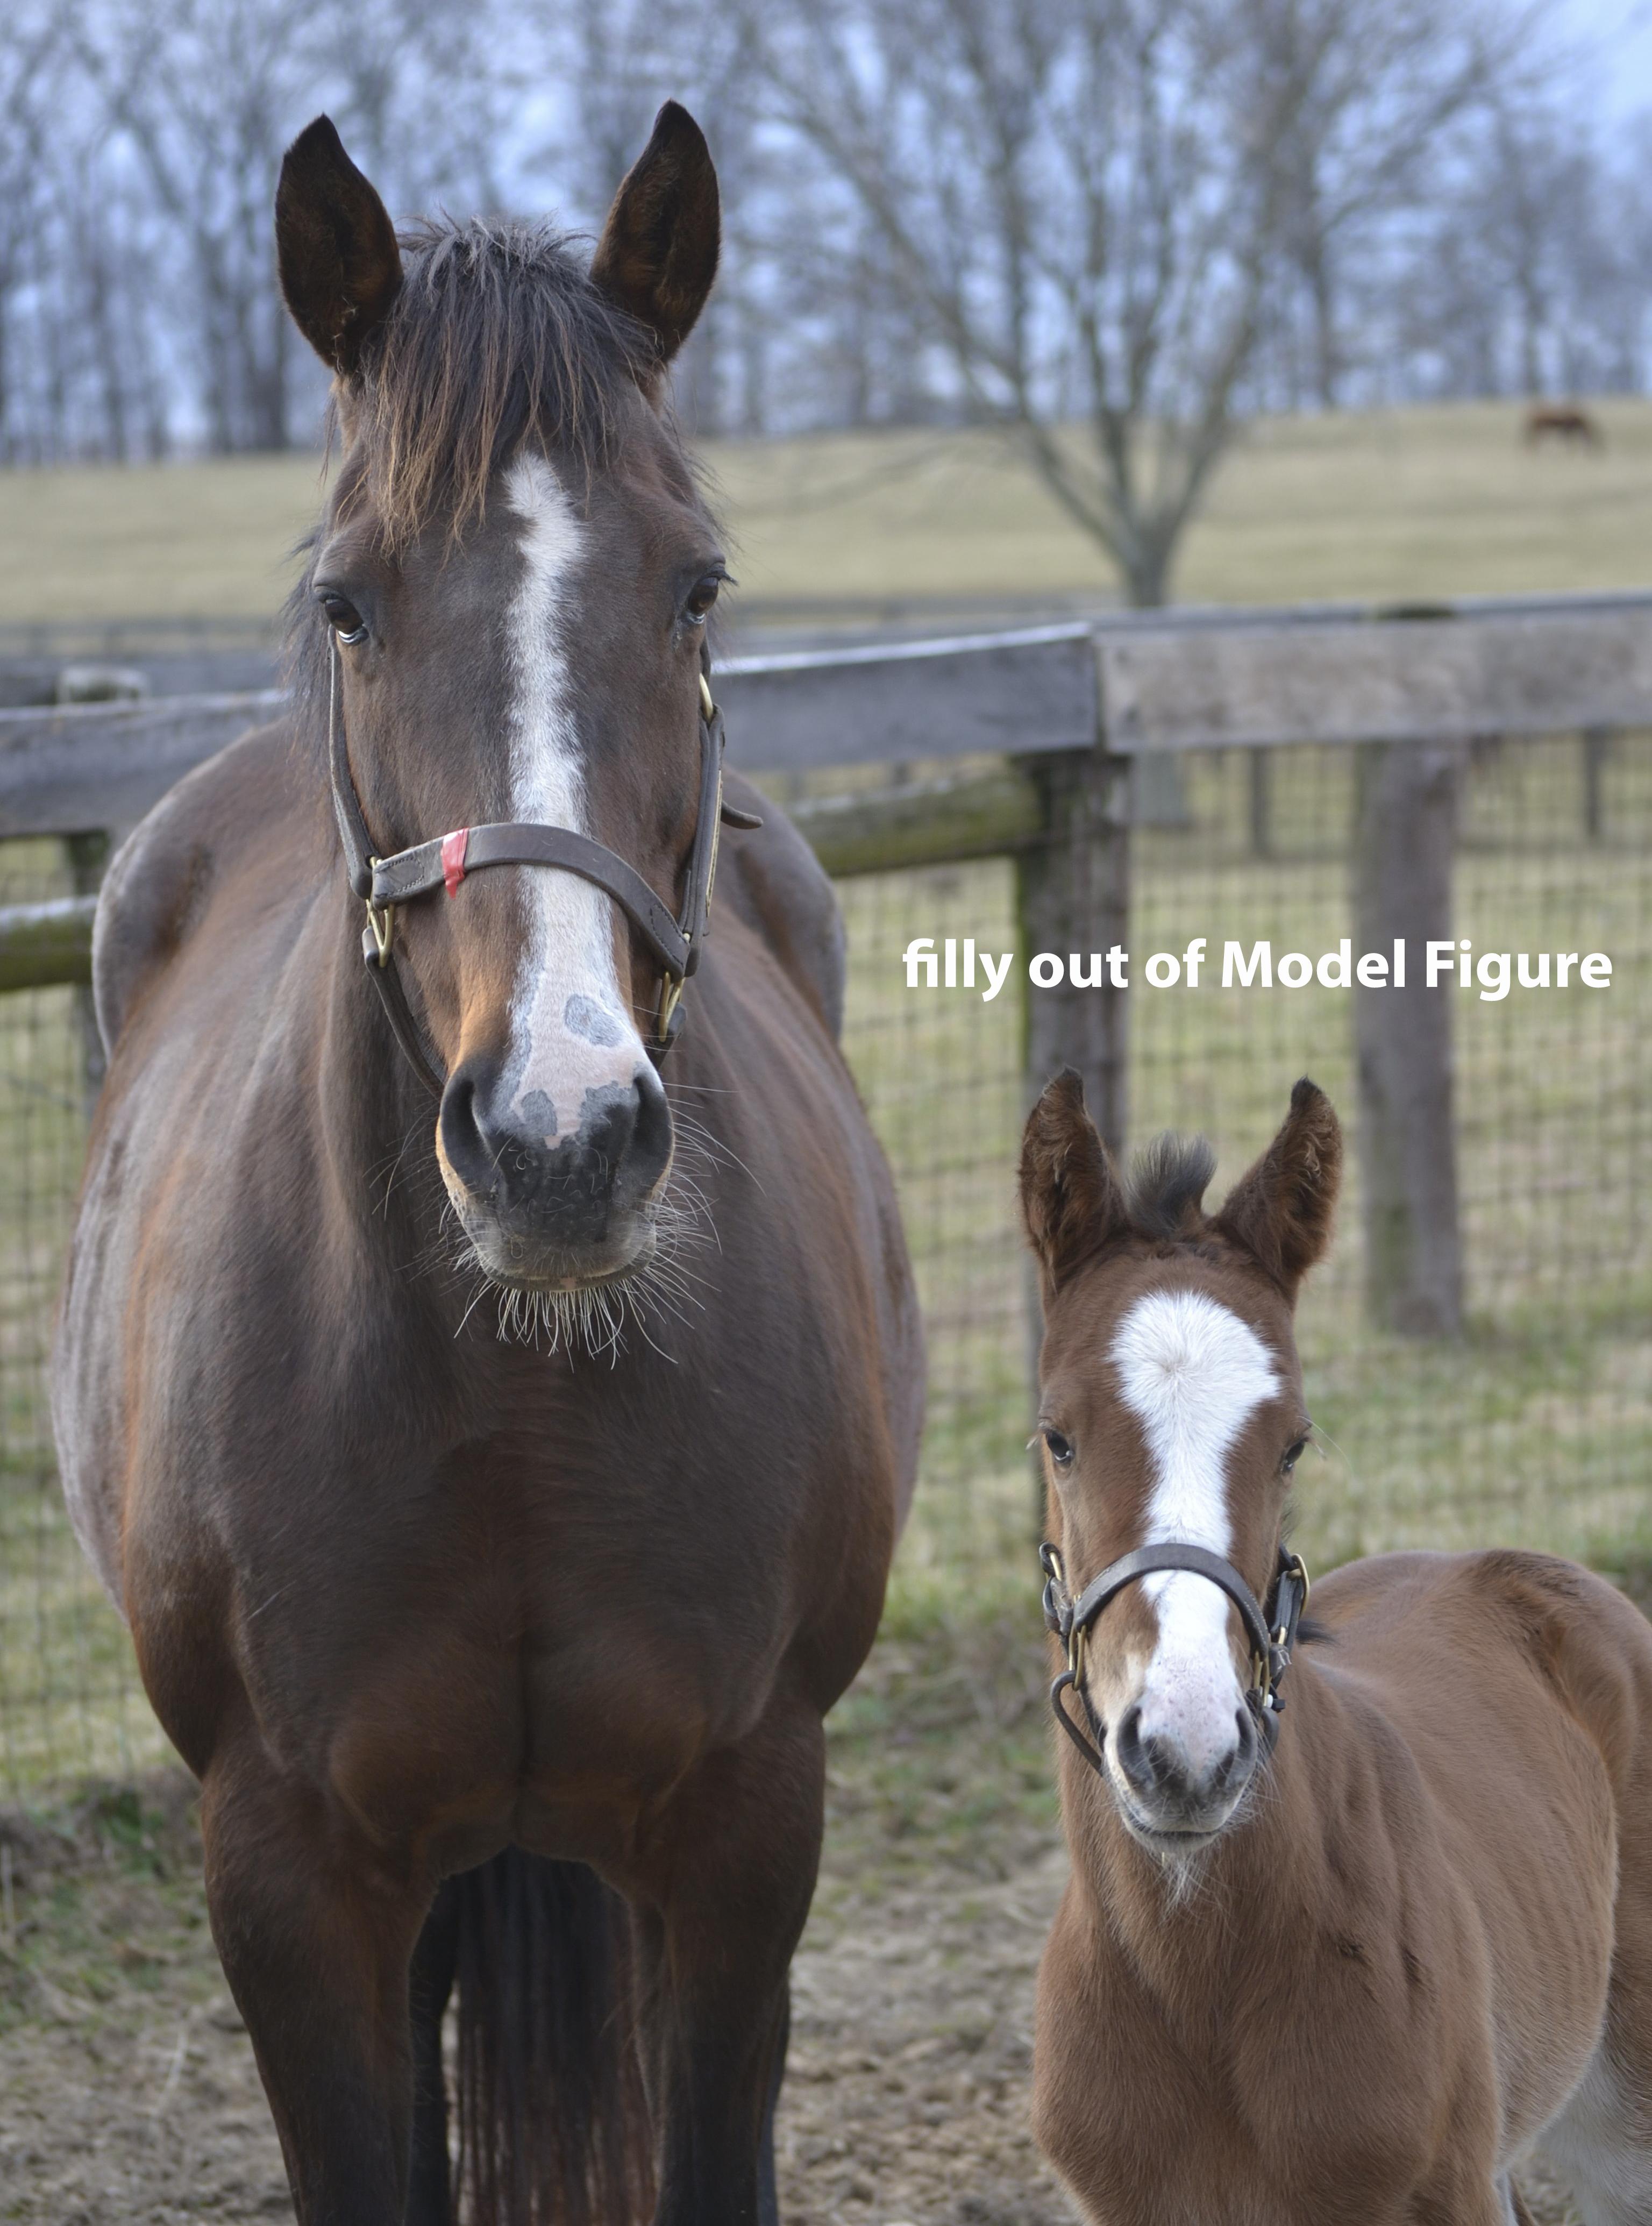 foals - photo #26